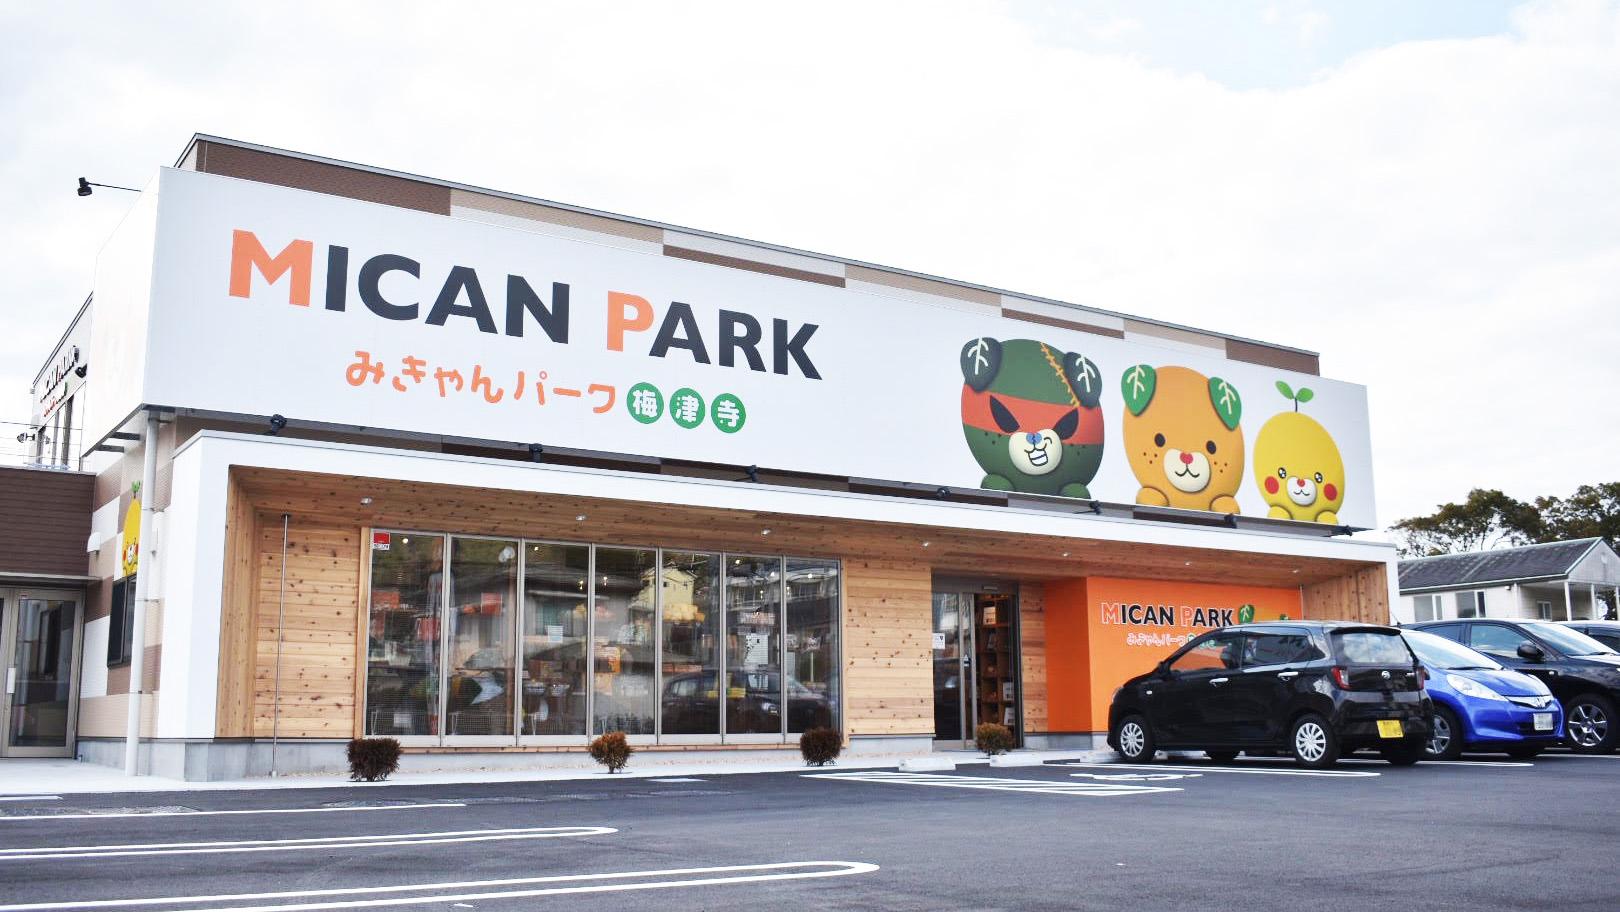 mican park(蜜柑狗狗专卖馆)